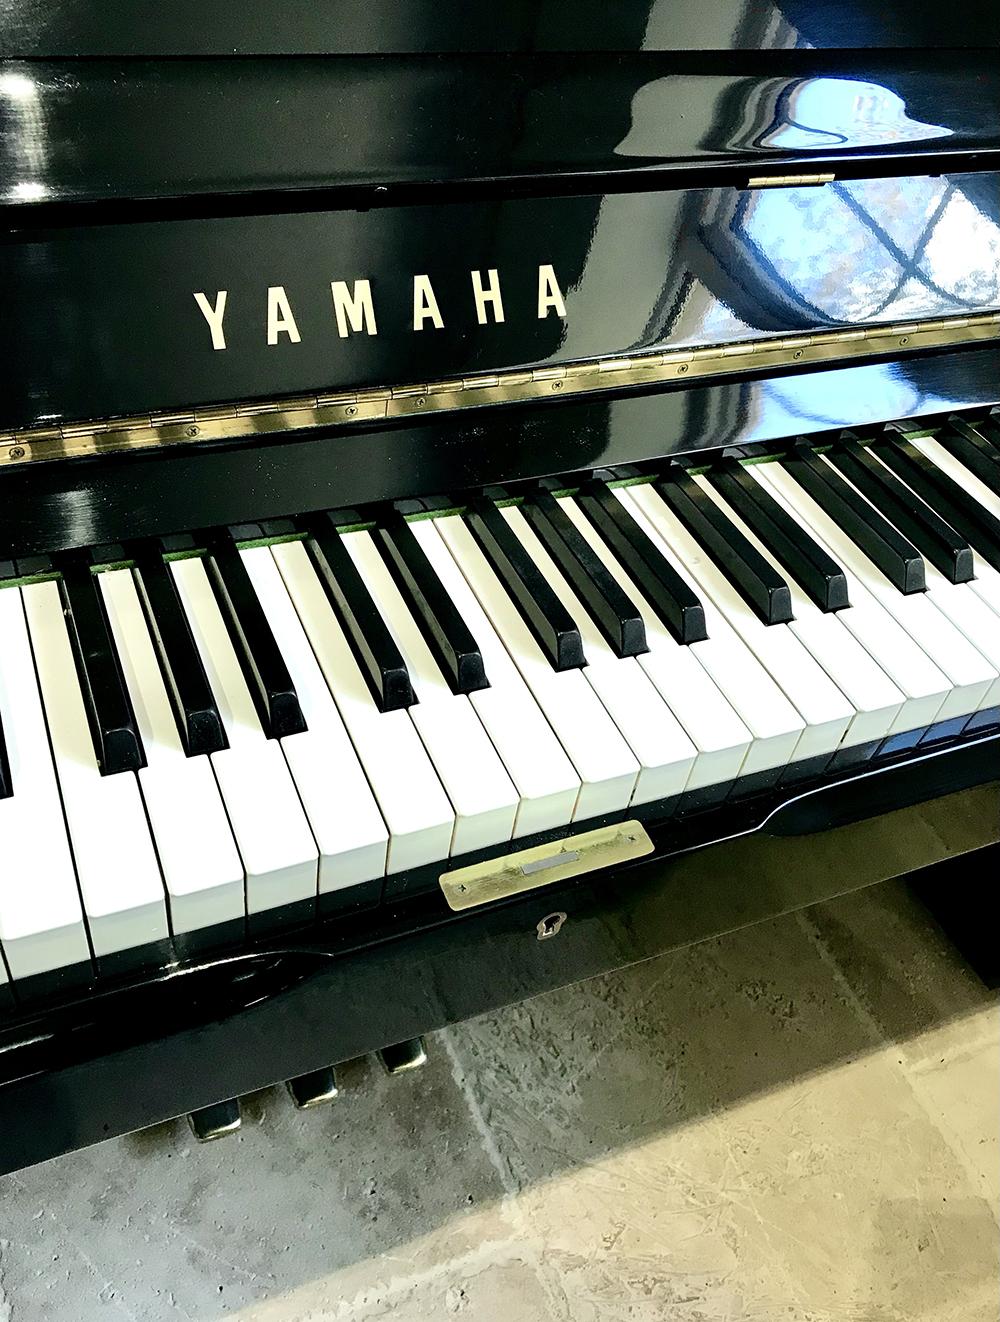 Yamaha-Piano-Dorset-U3-X-8.jpg